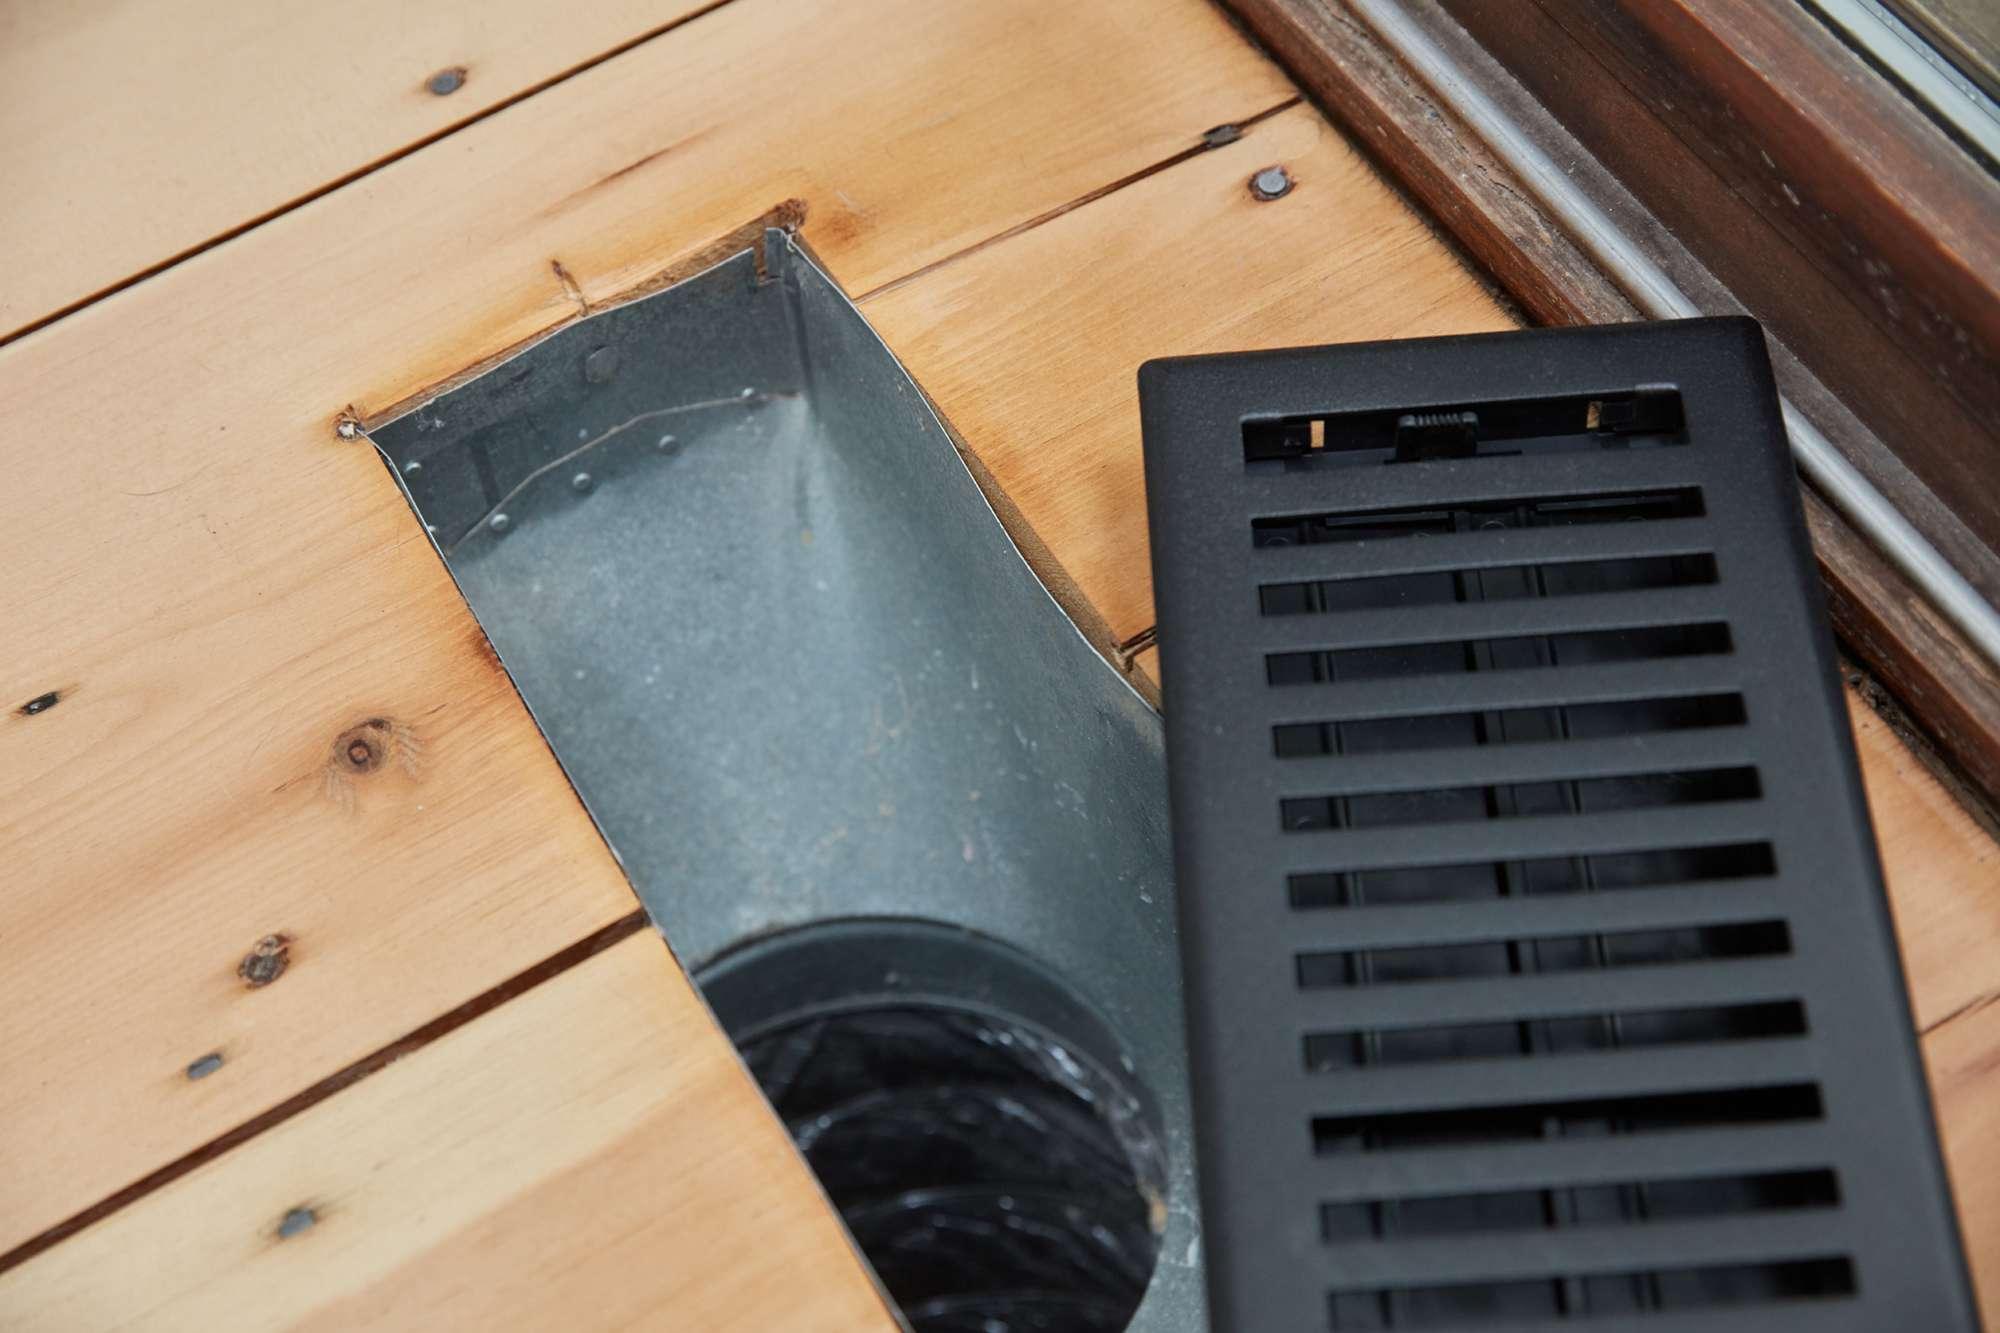 Exposed floor HVAC vent in wood flooring